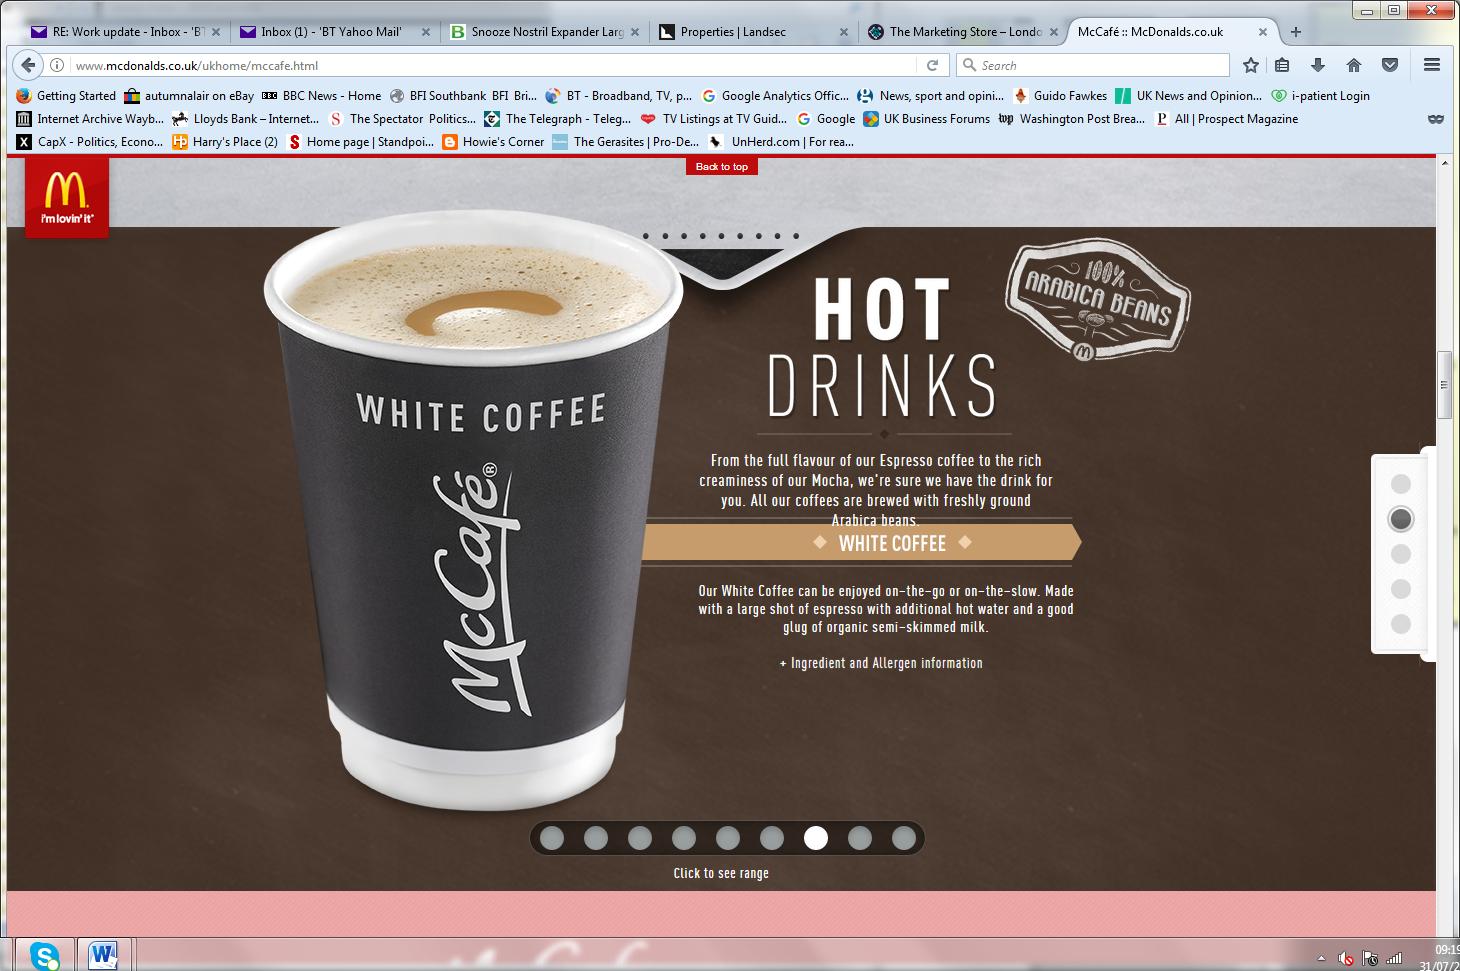 McDonalds web promotion page